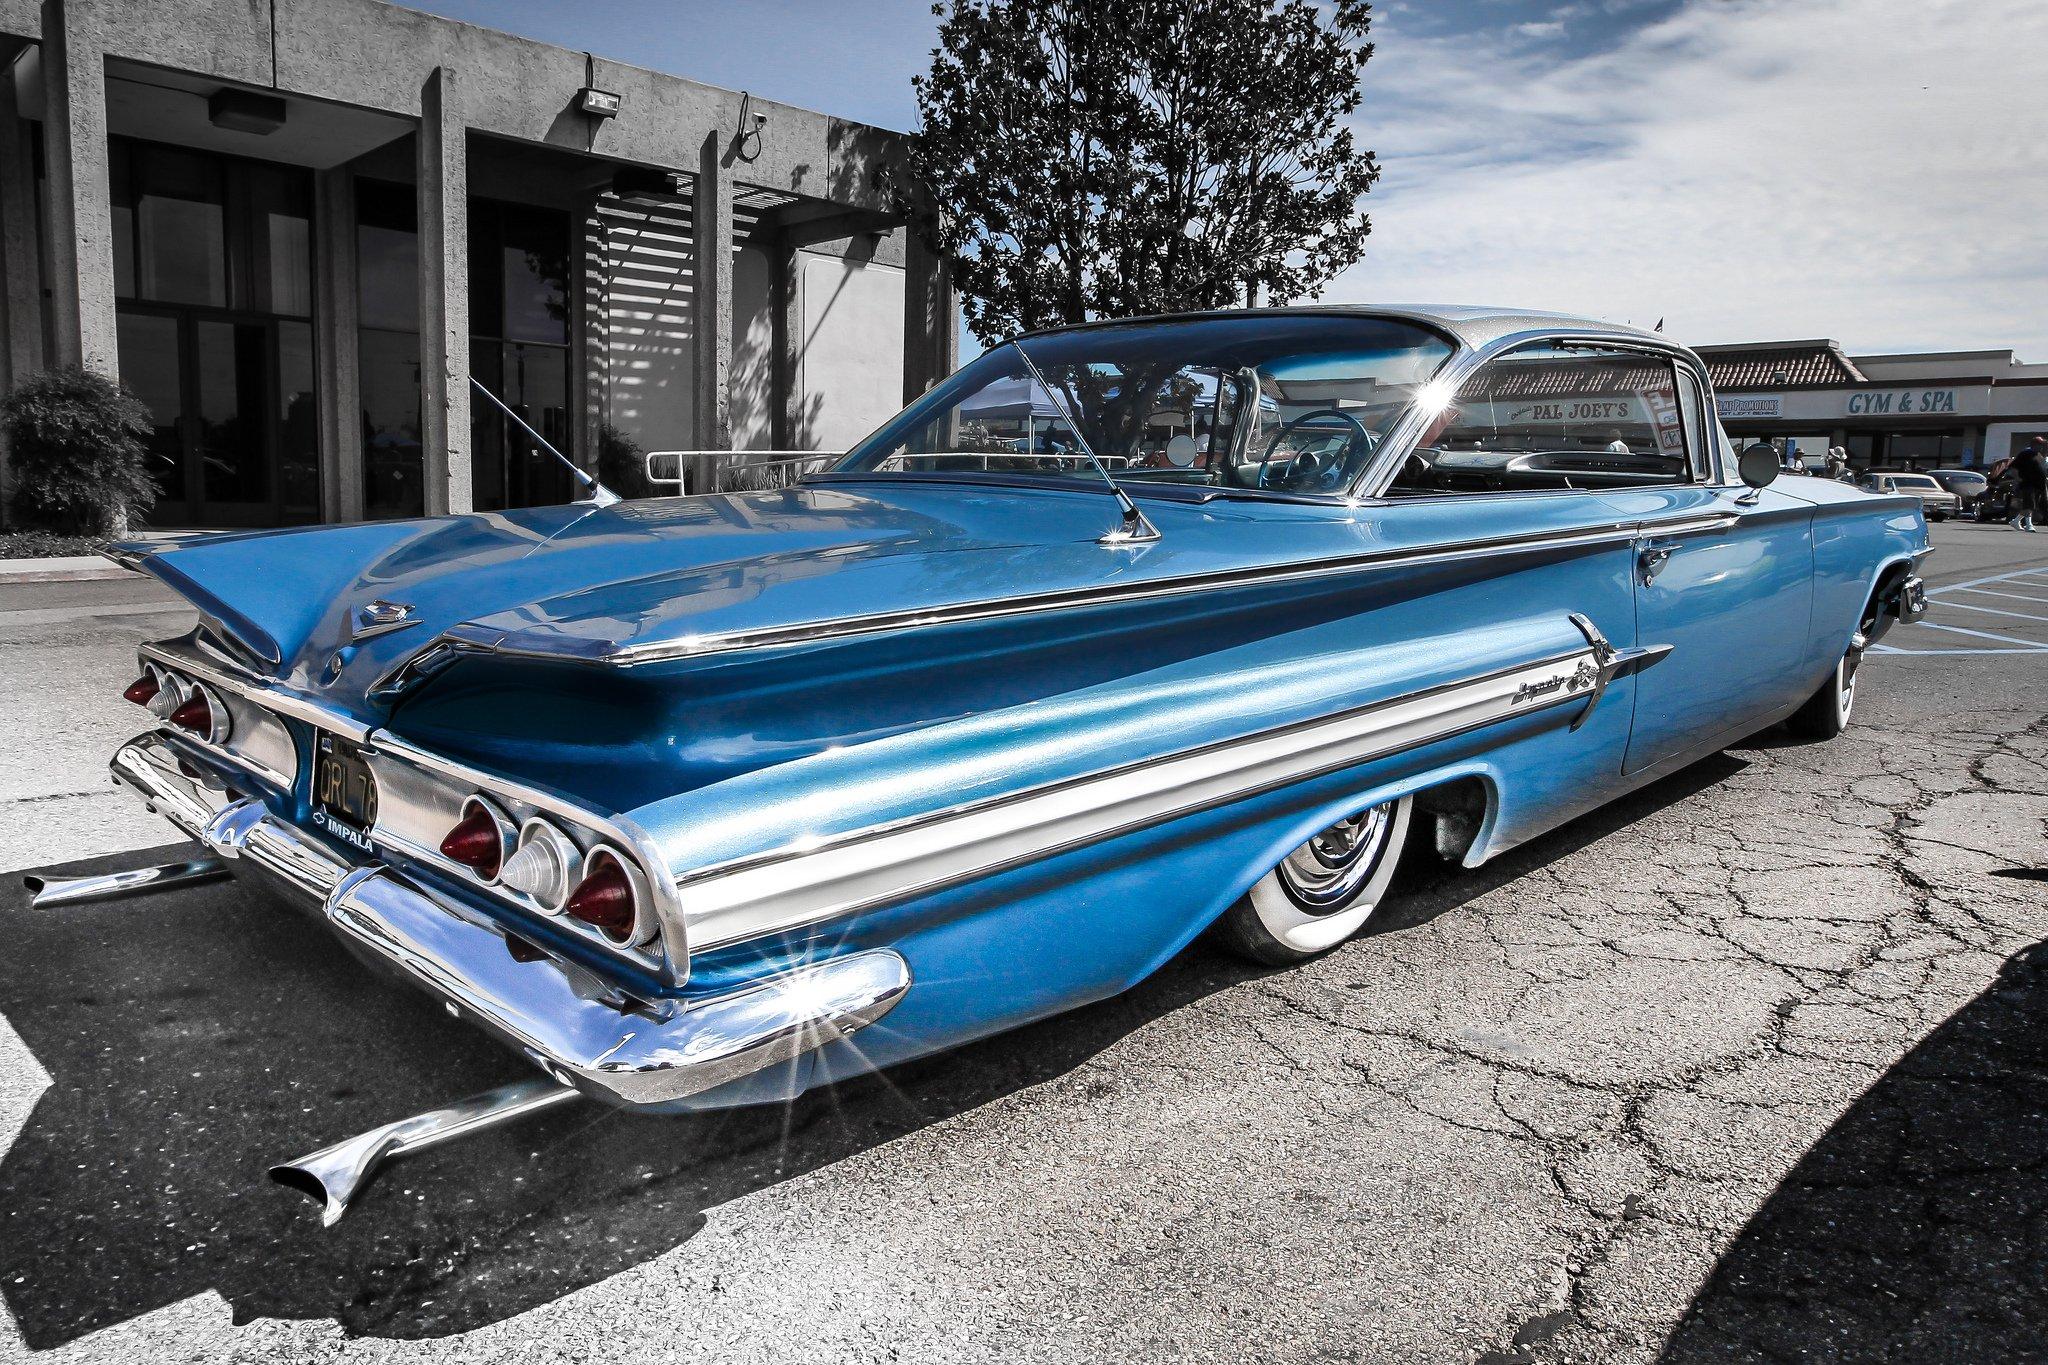 Street Rod Hot Rod Custom Cars Lo Rider Vintage Cars Usa Wallpaper